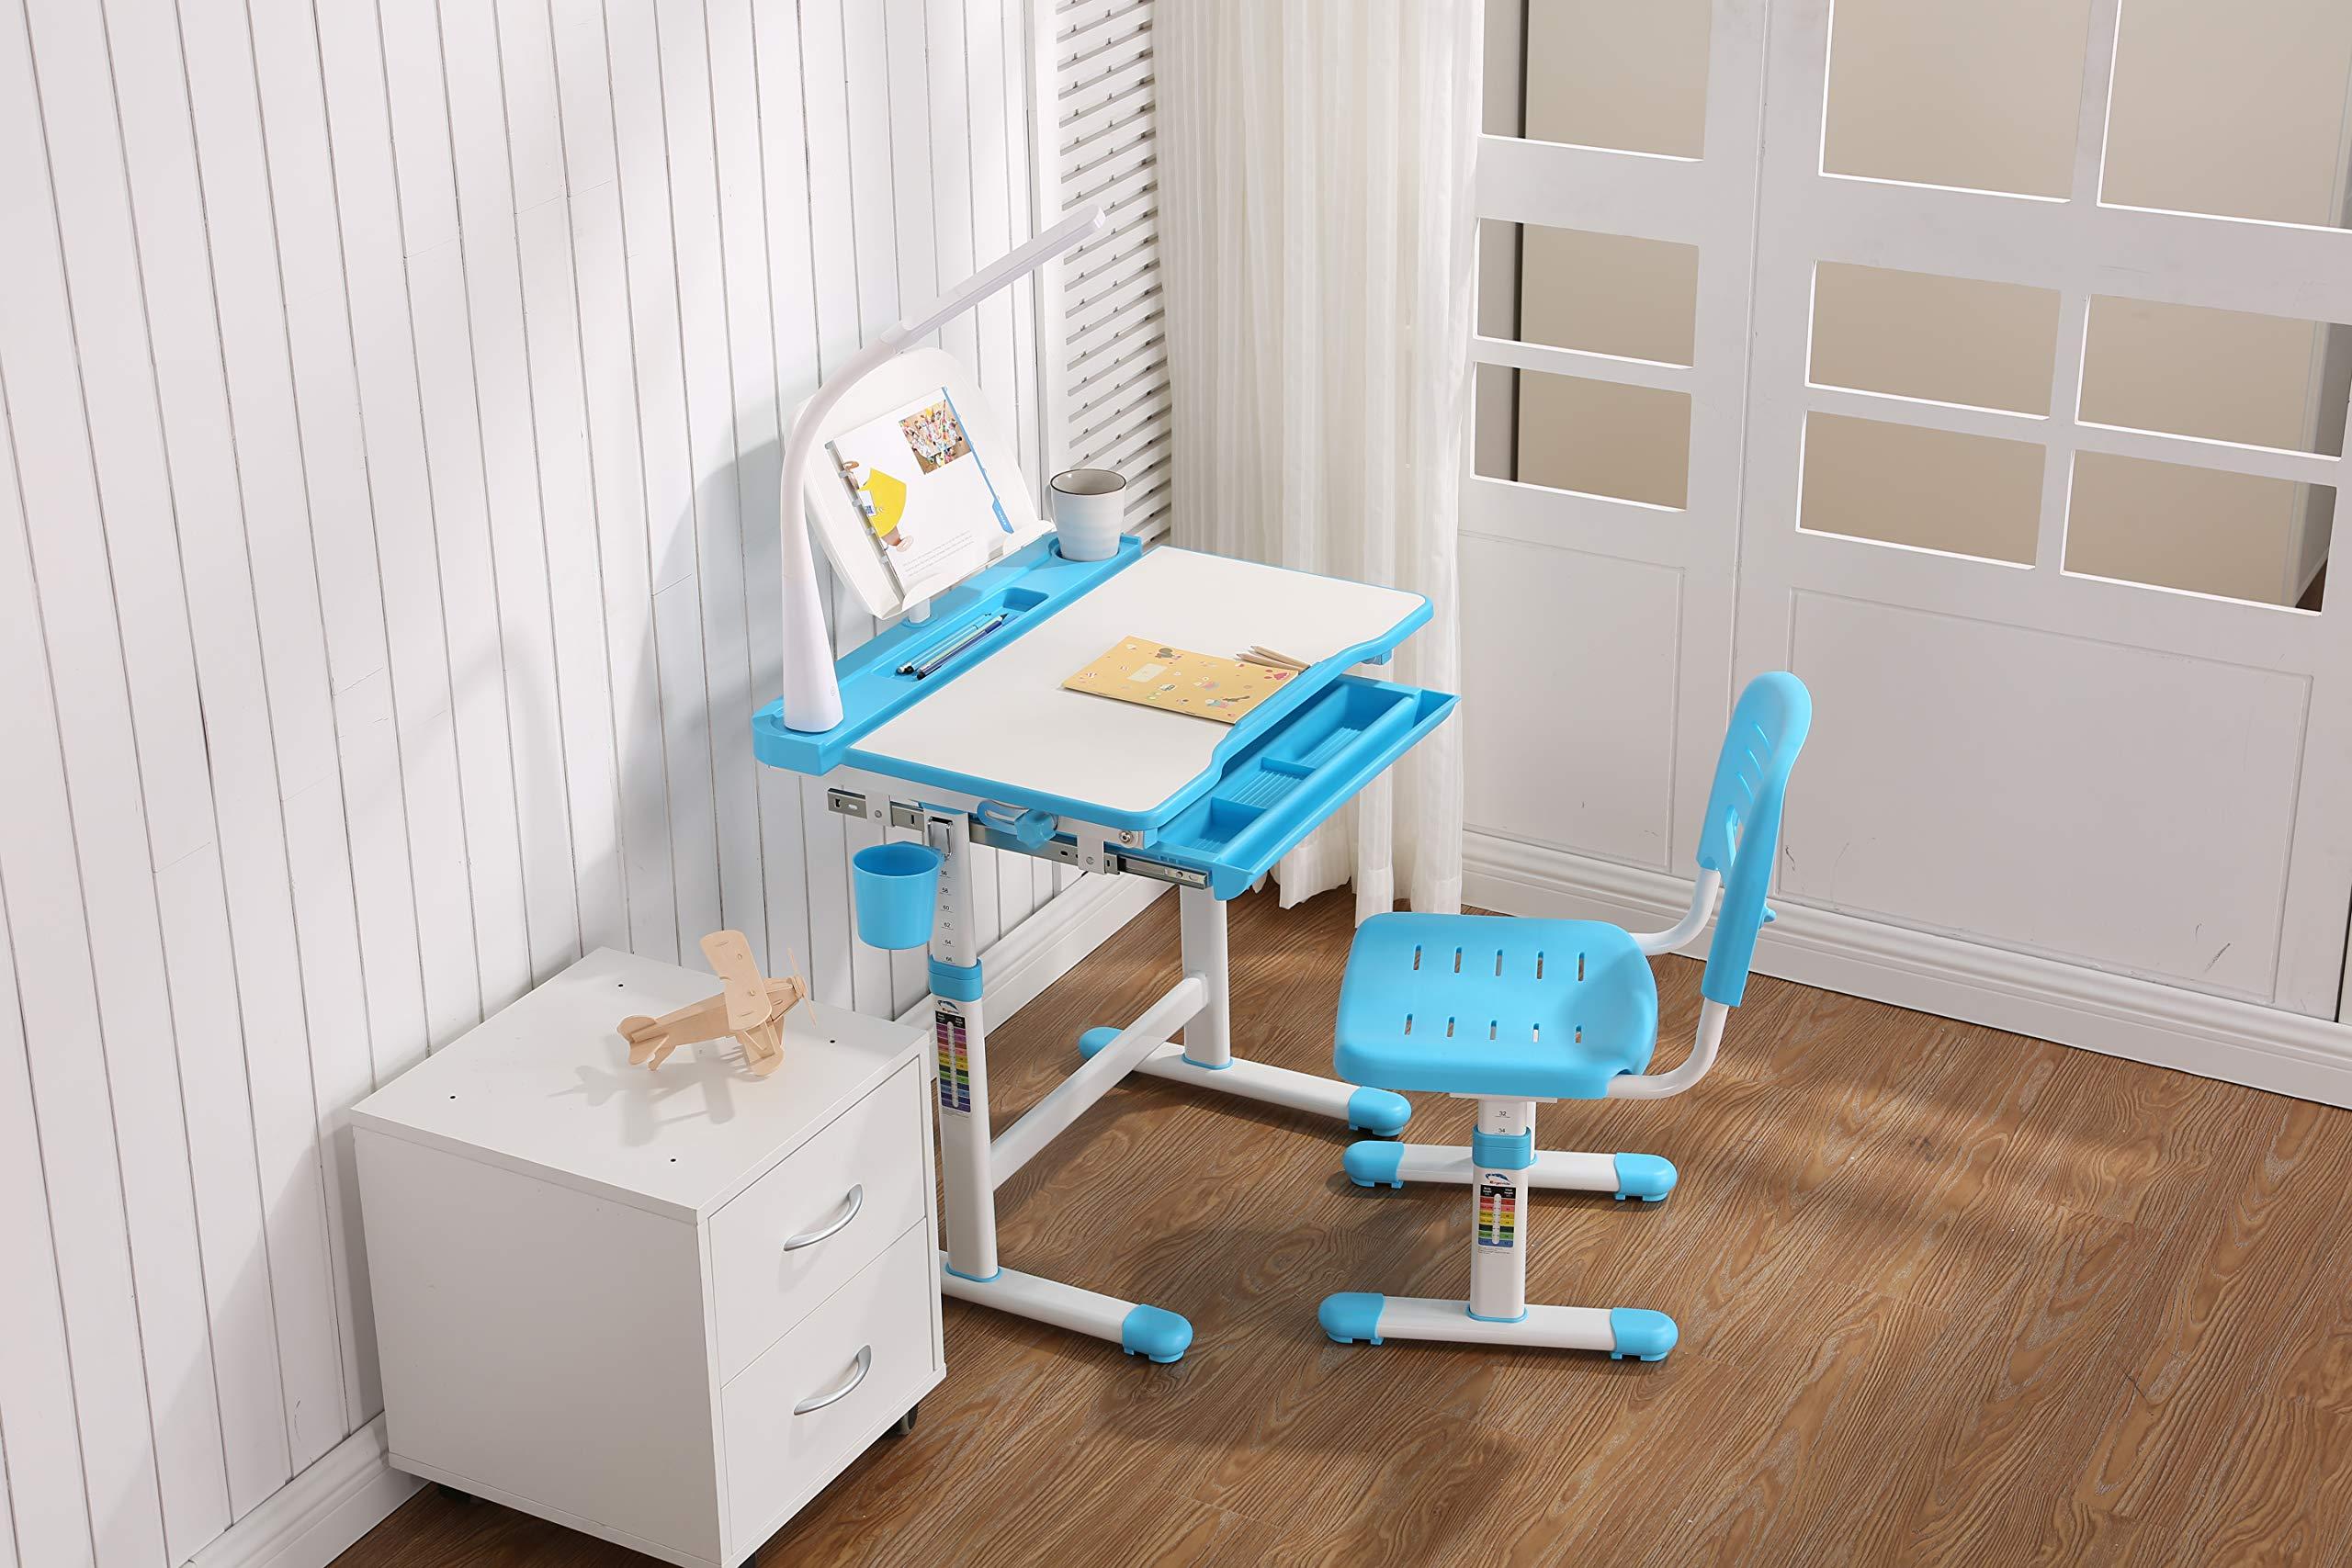 Estink Children Study Desk Chair Set Adjustable Height Rotation Anti-slip Kids Comfortable Learning Table with UK Plug Lamp 100-240 V Blue